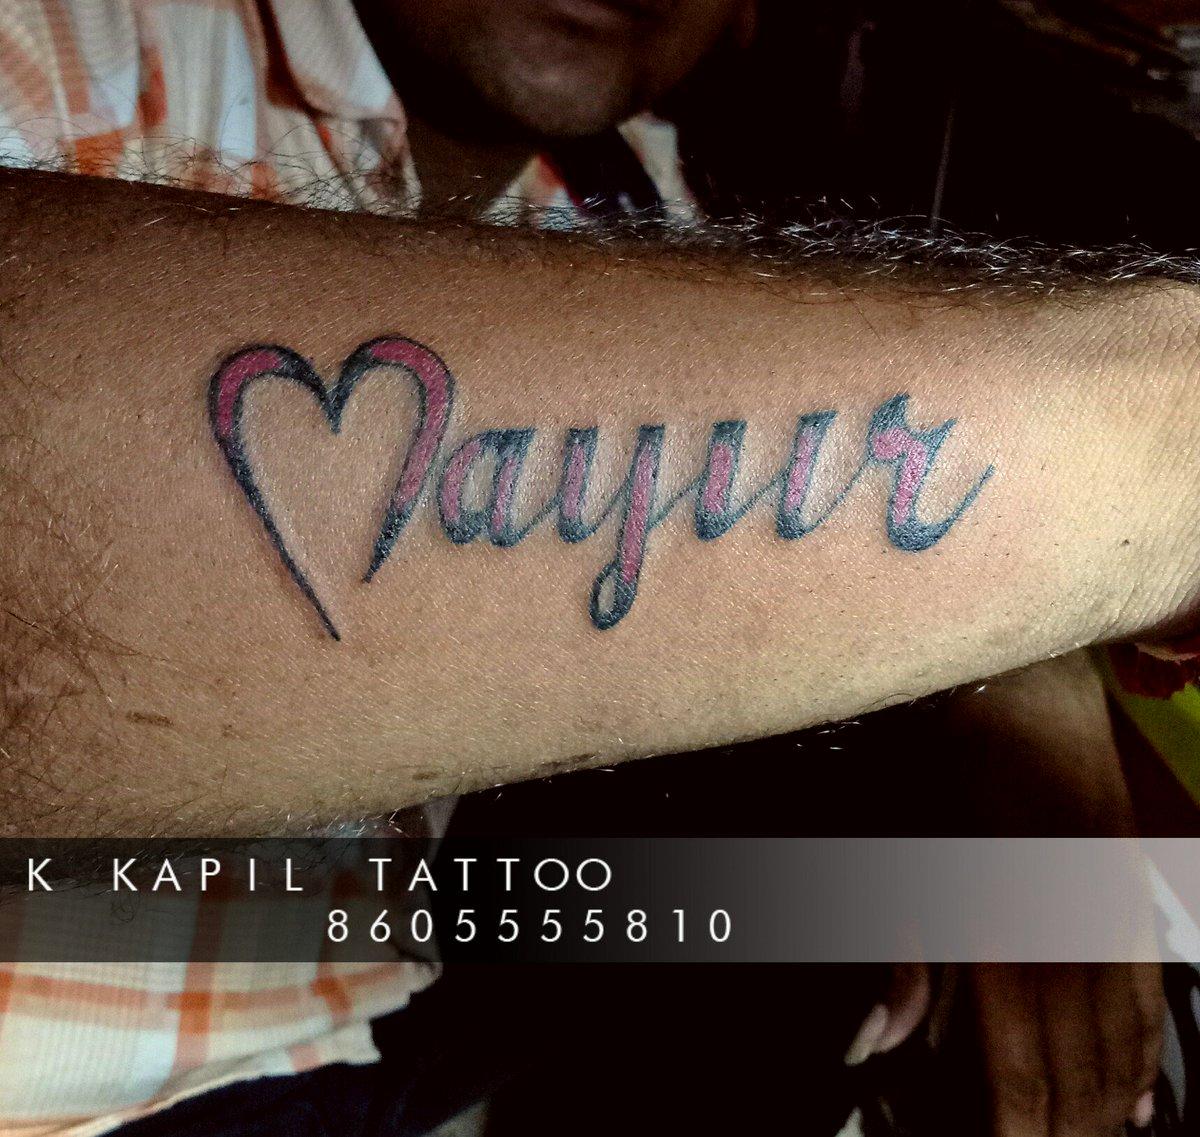 K Kapil Tattoo Auf Twitter Mayur Name Chopinscript With Heart